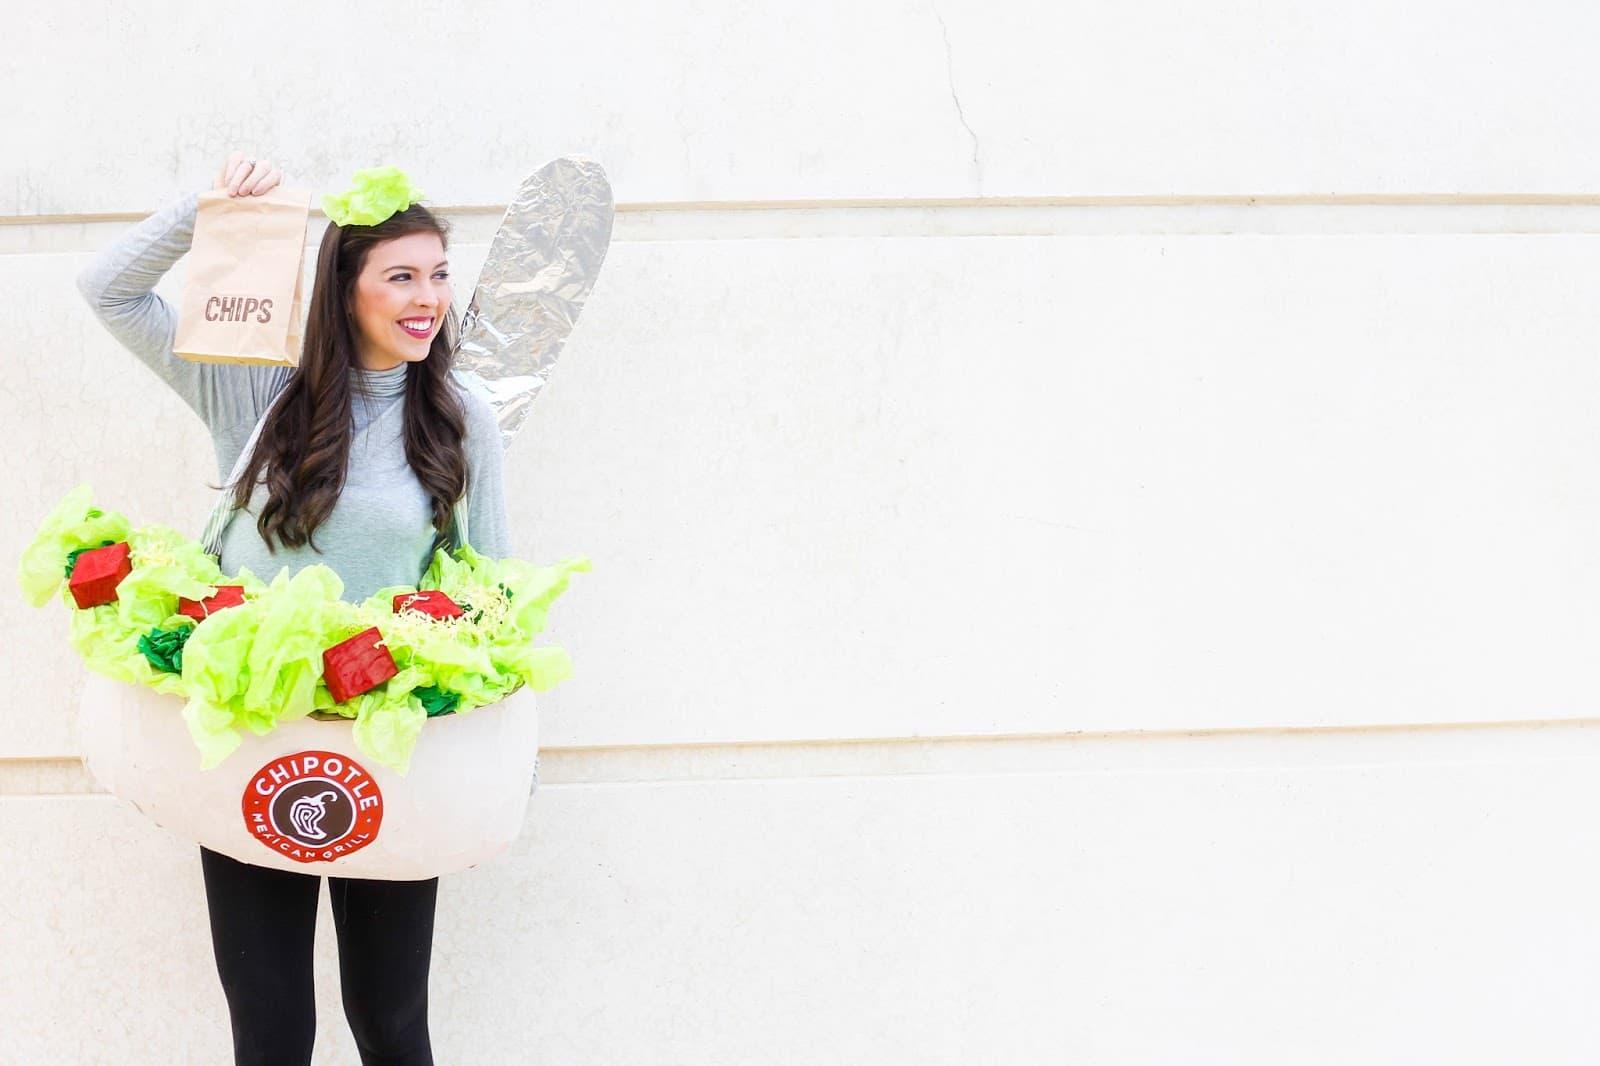 Halloween Chipotle Costume DIY